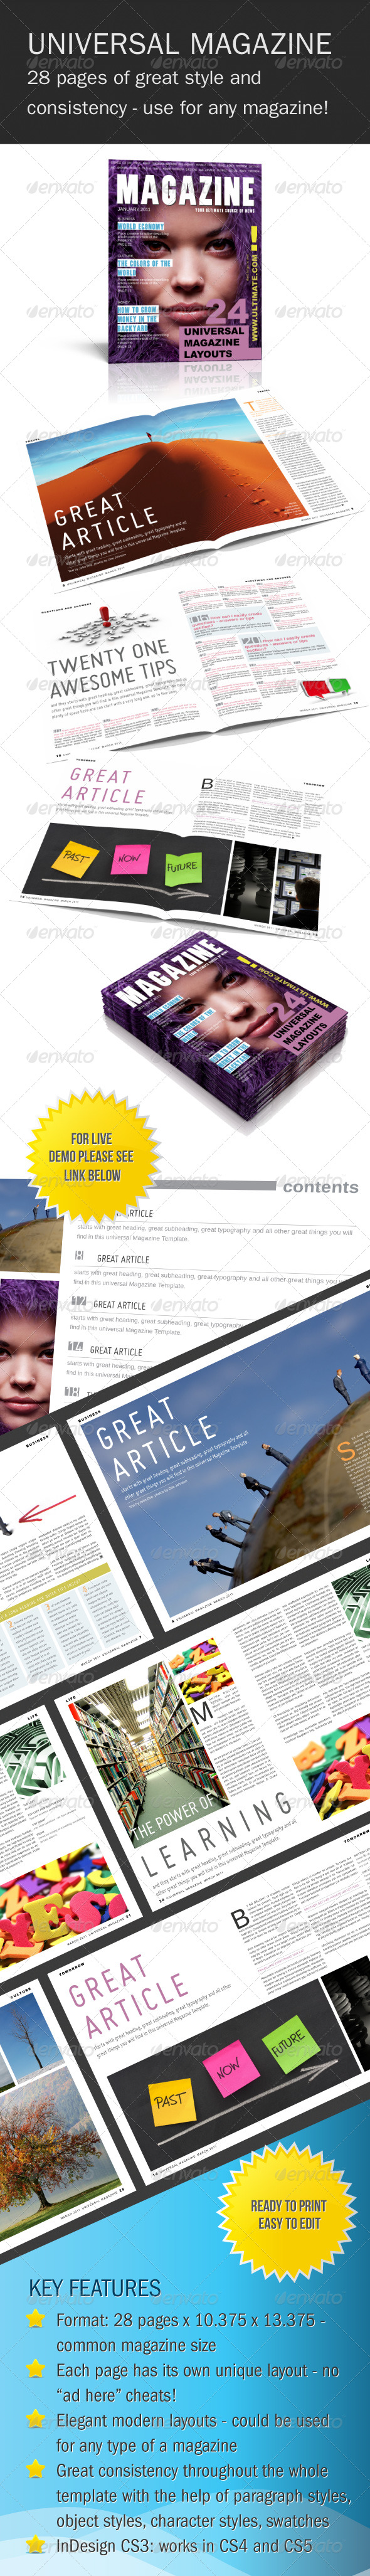 GraphicRiver Universal InDesign Magazine Template 224035